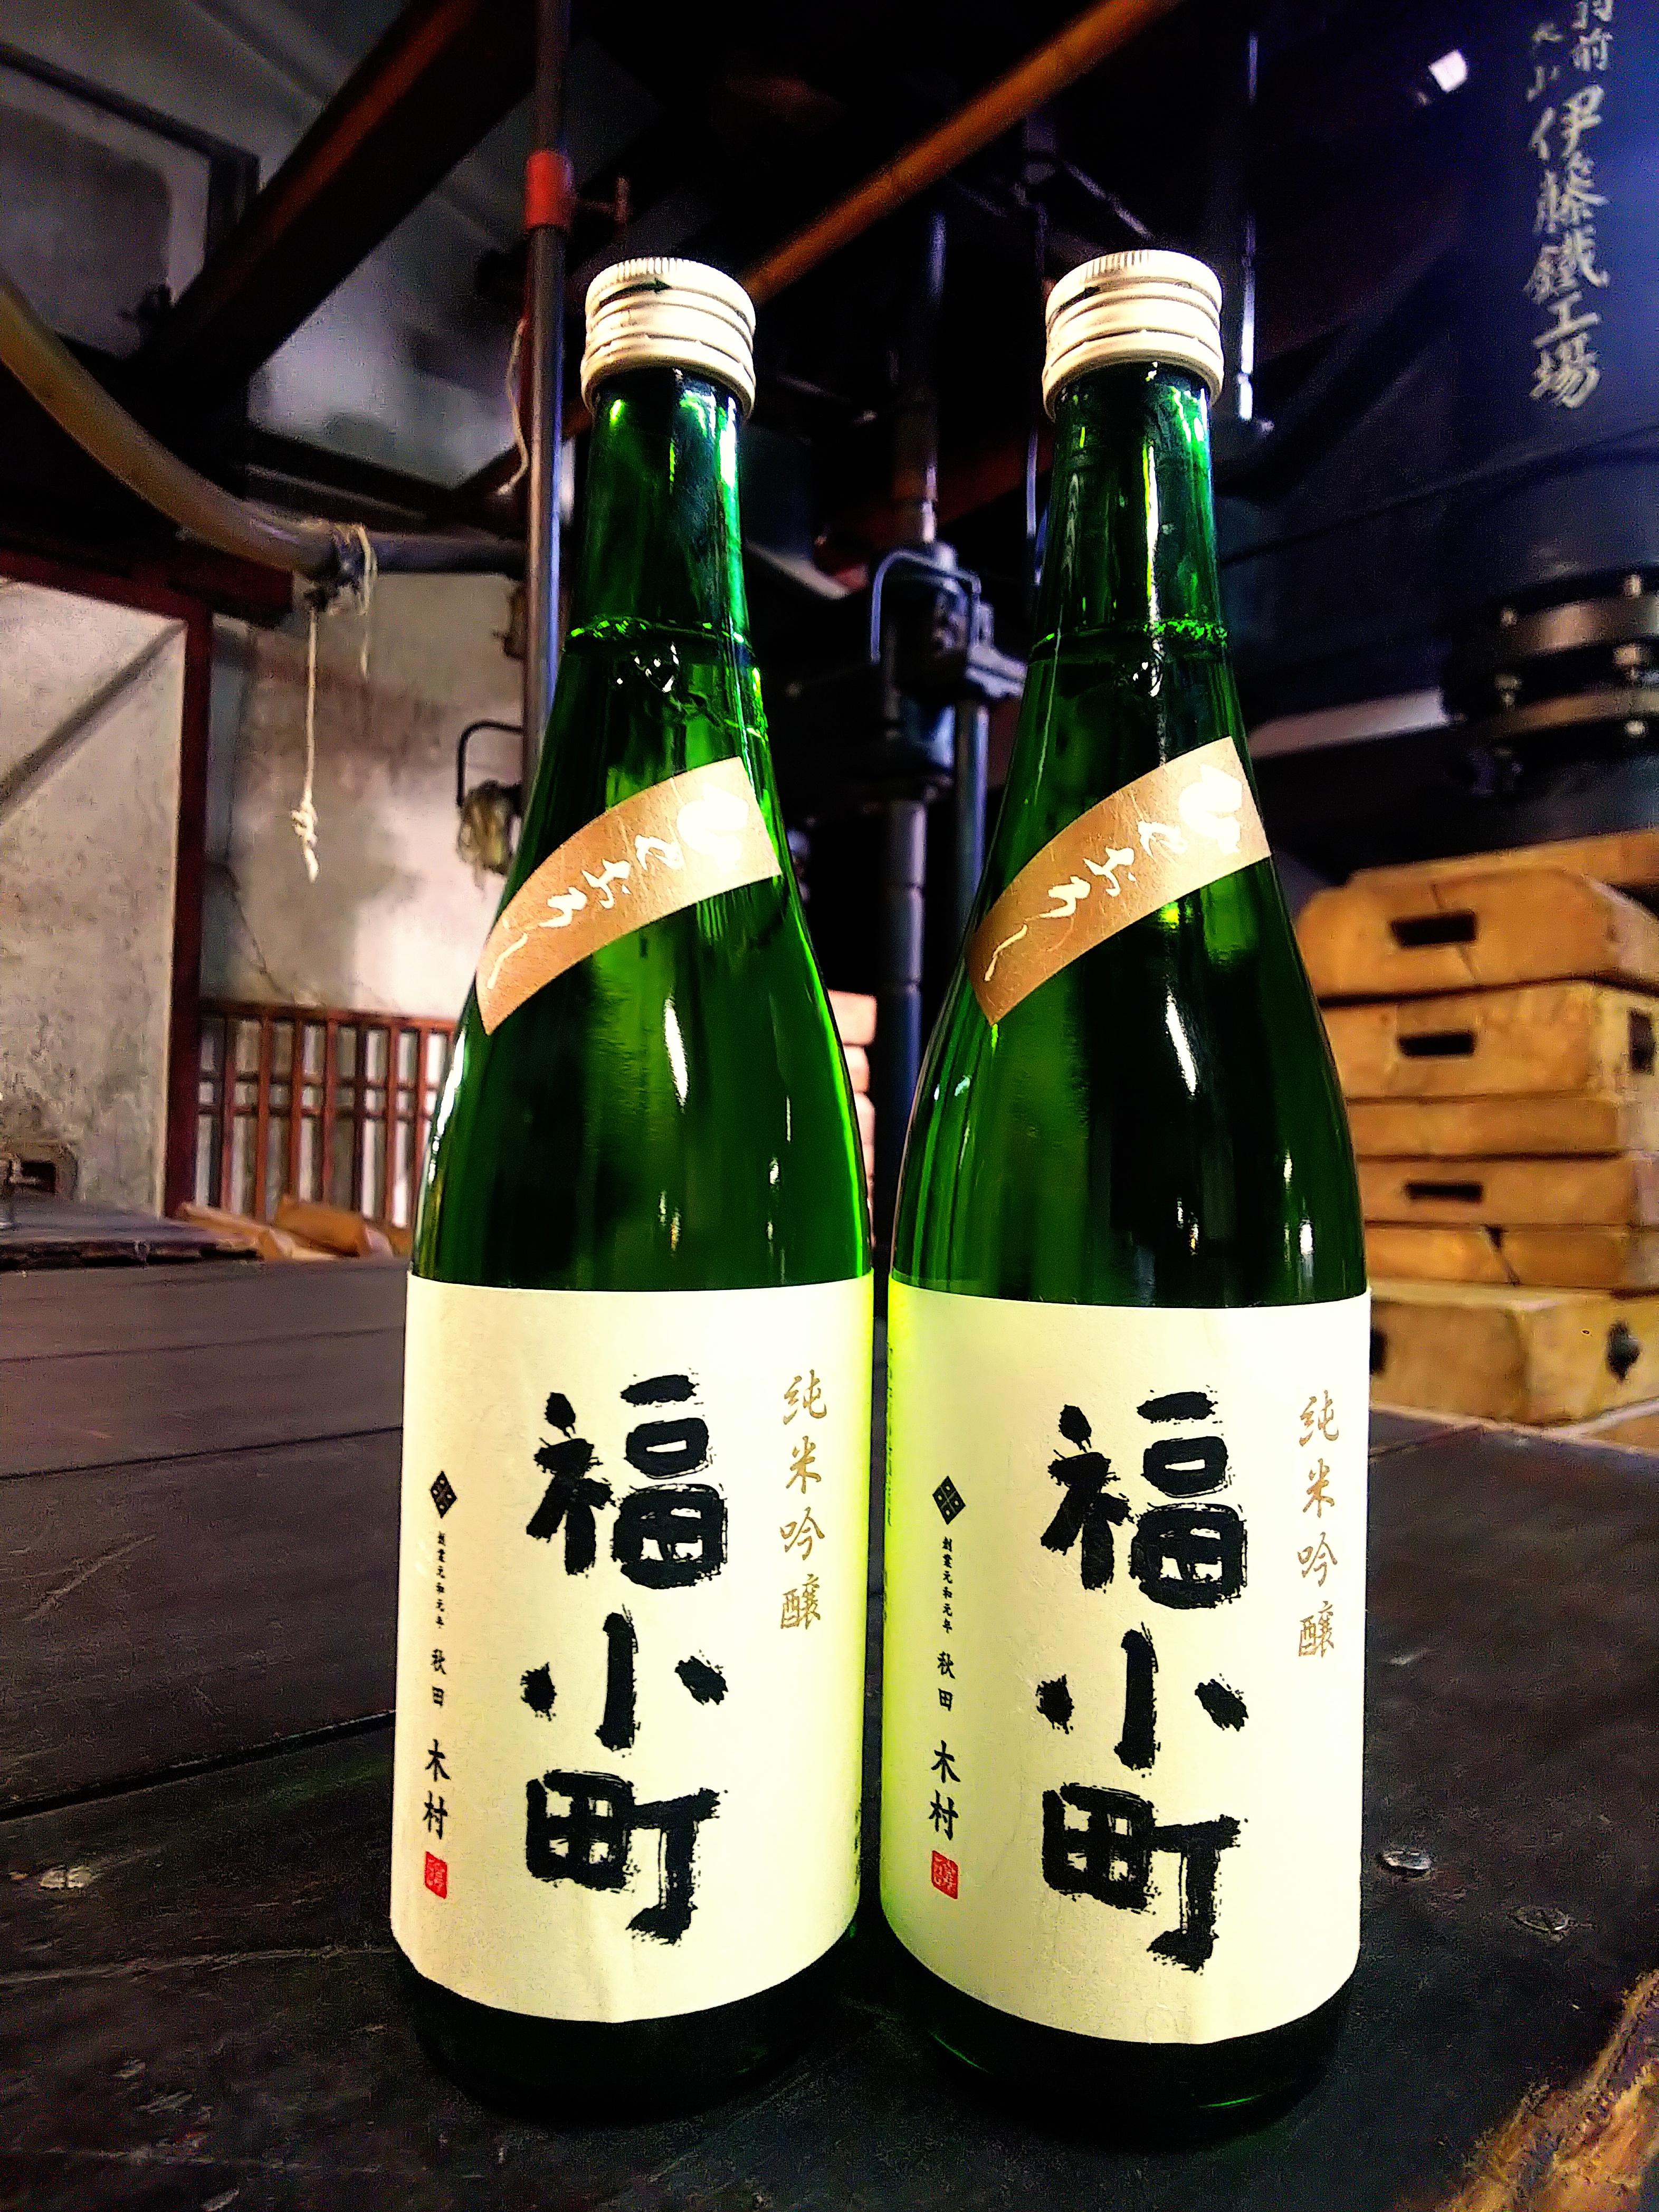 http://www.fukukomachi.com/blog/photo/C360_2020-09-01-08-45-46-607.jpg